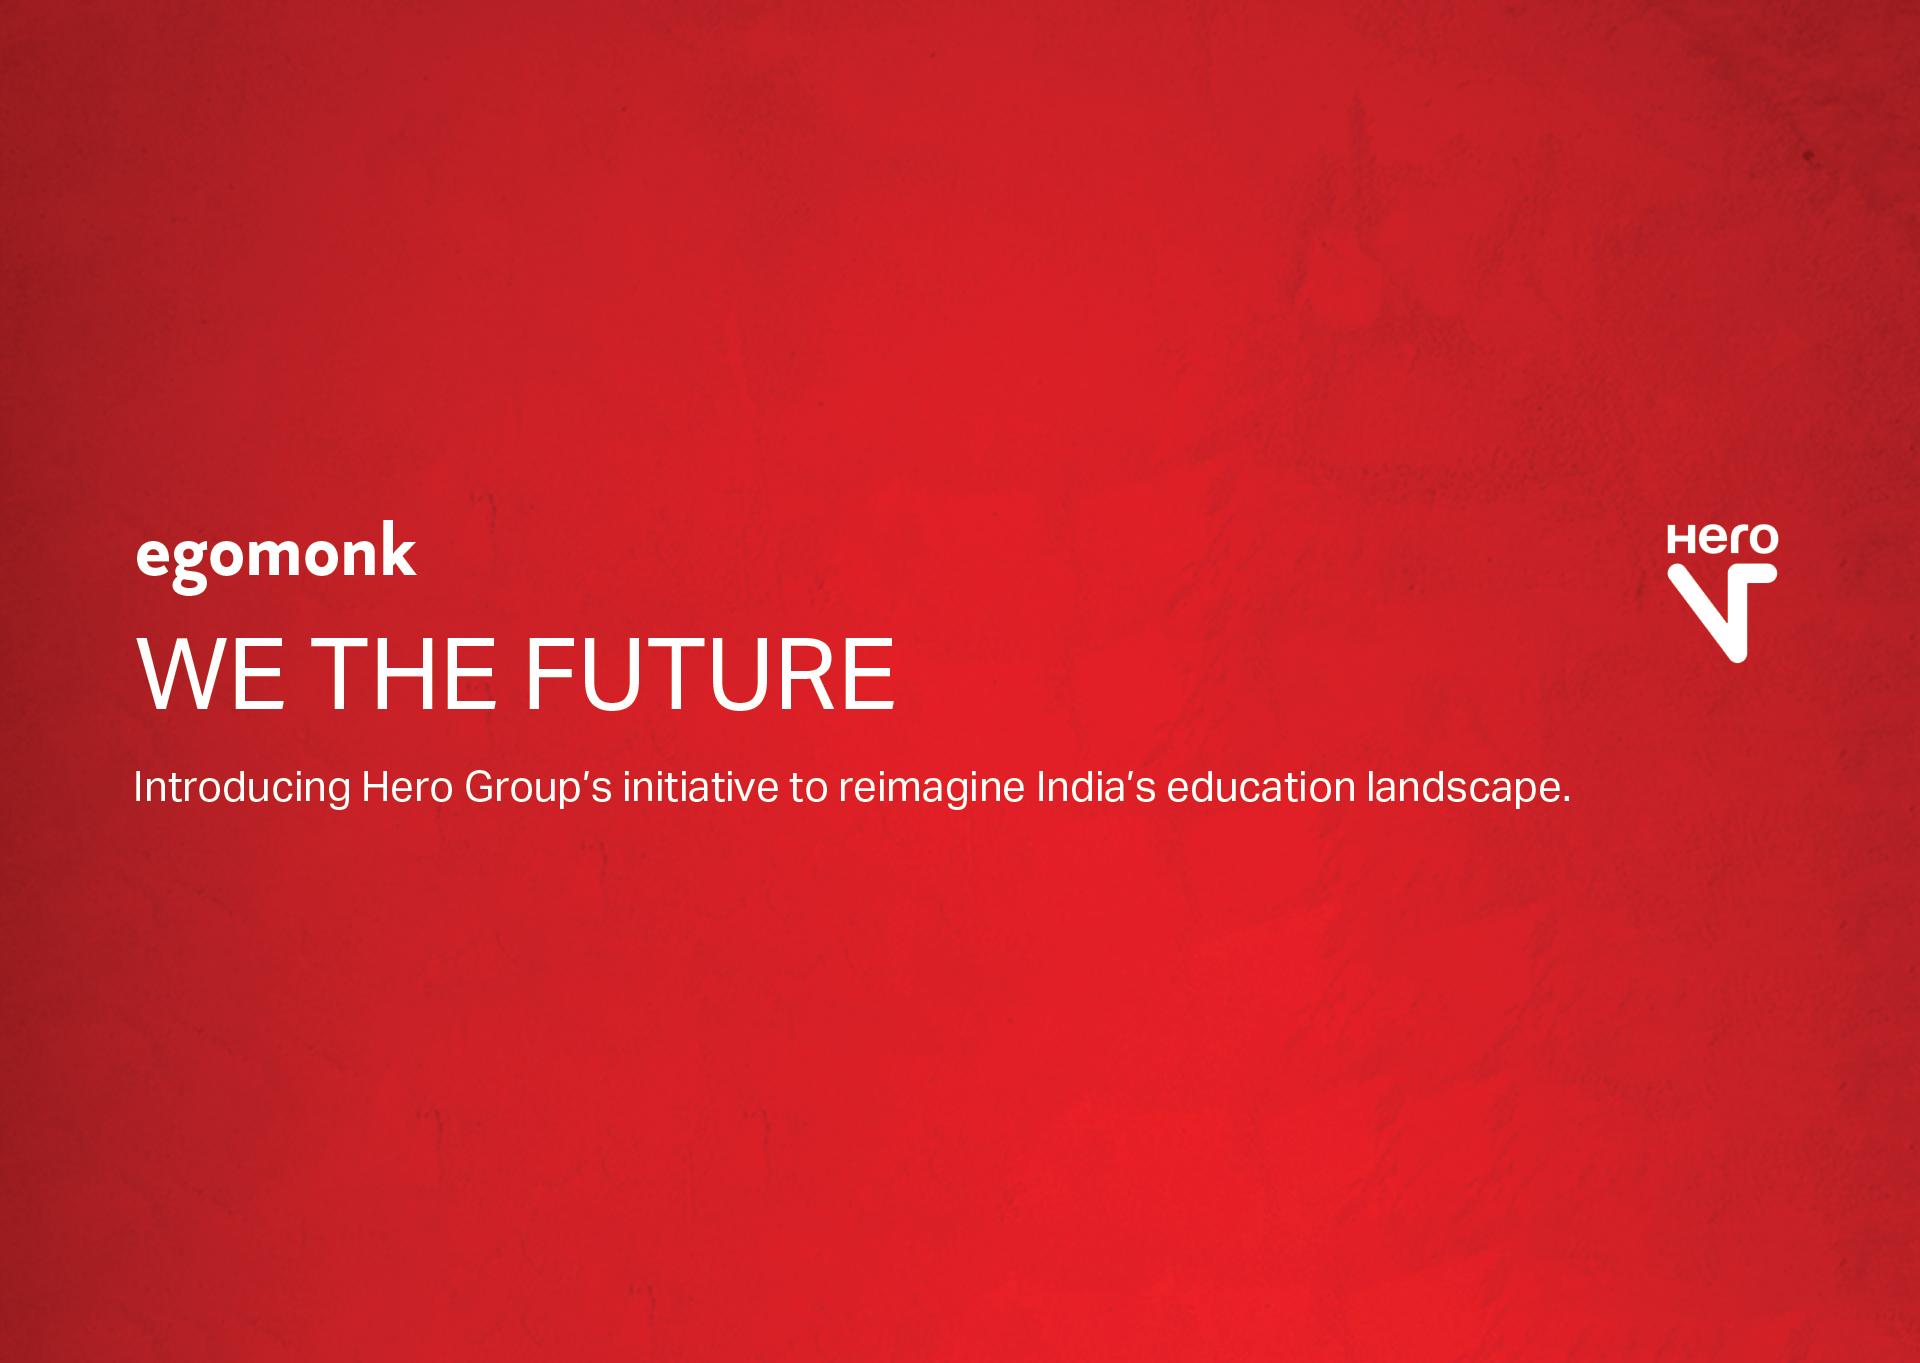 Case Study: We The Future